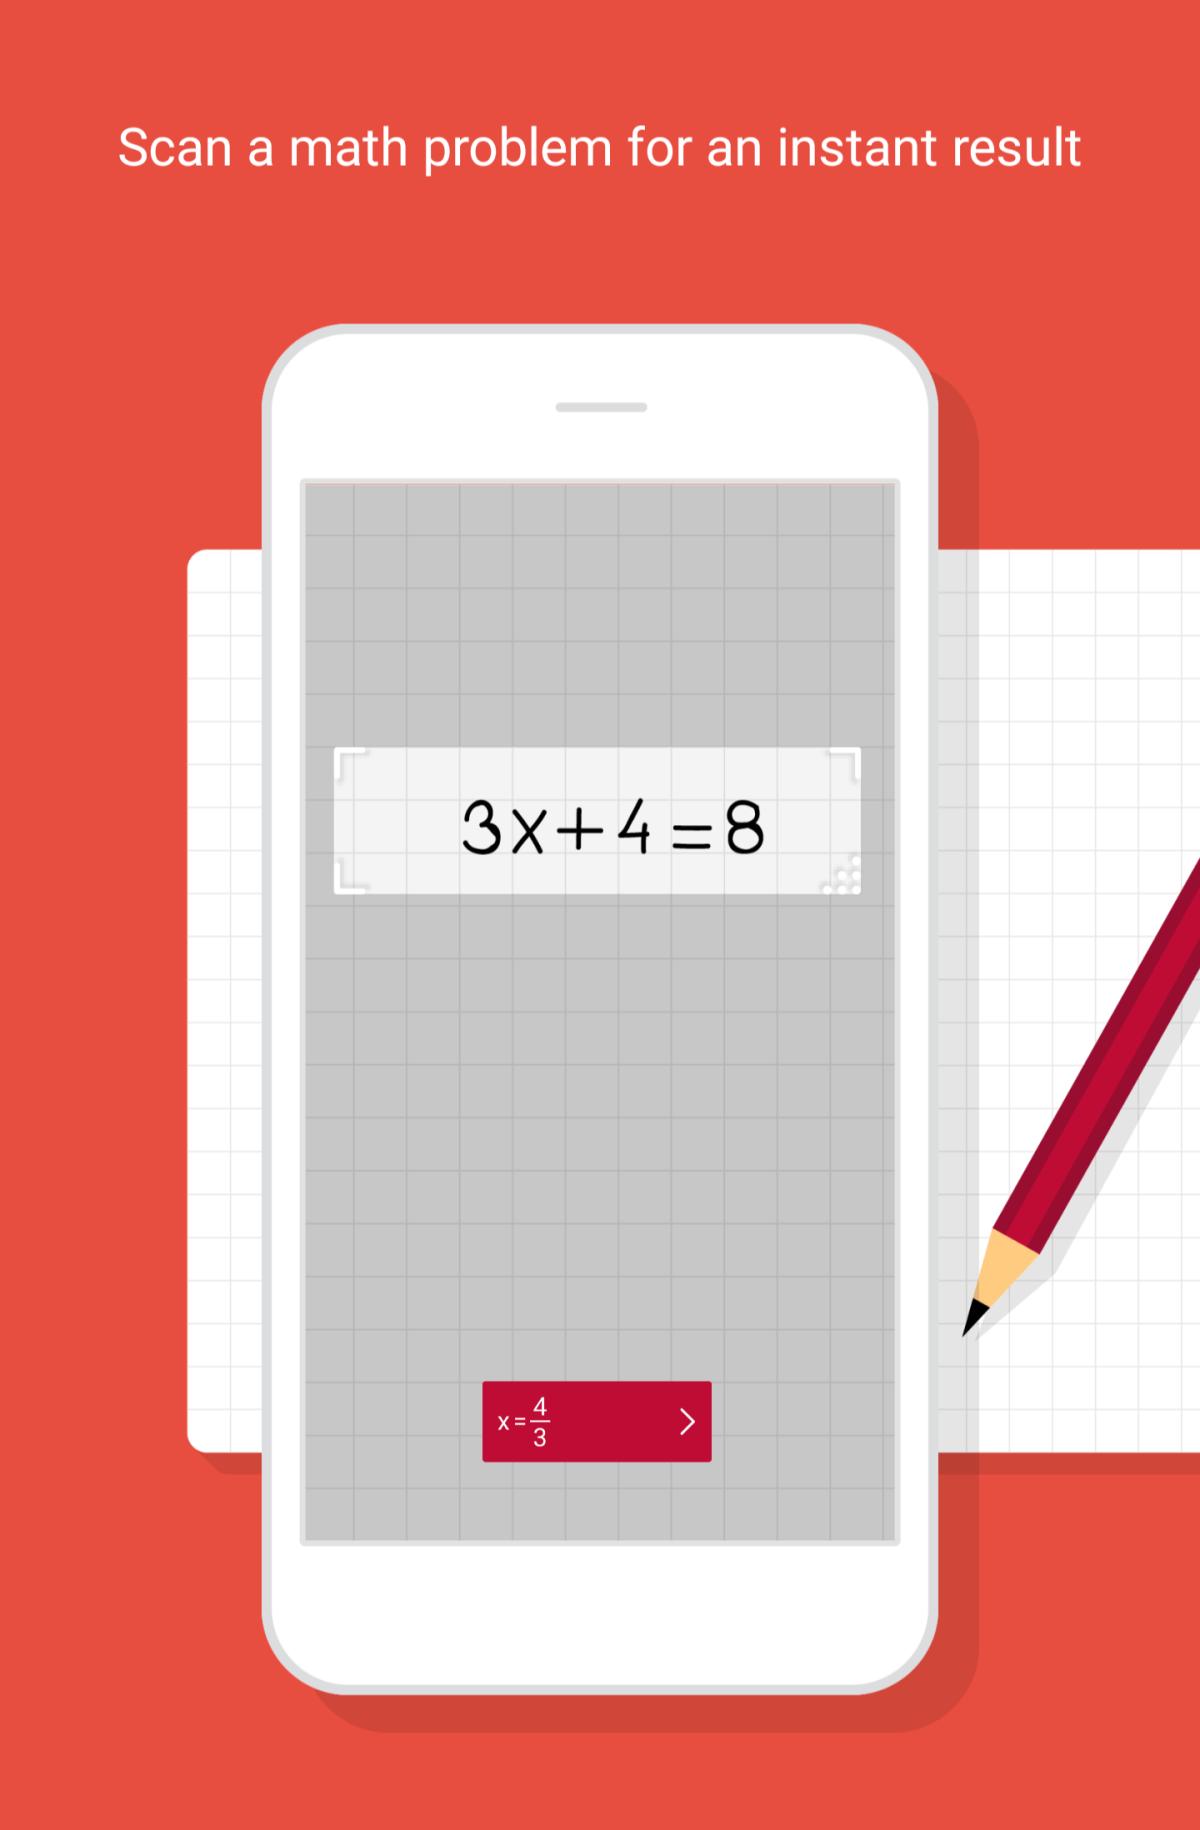 New math app – good orbad?